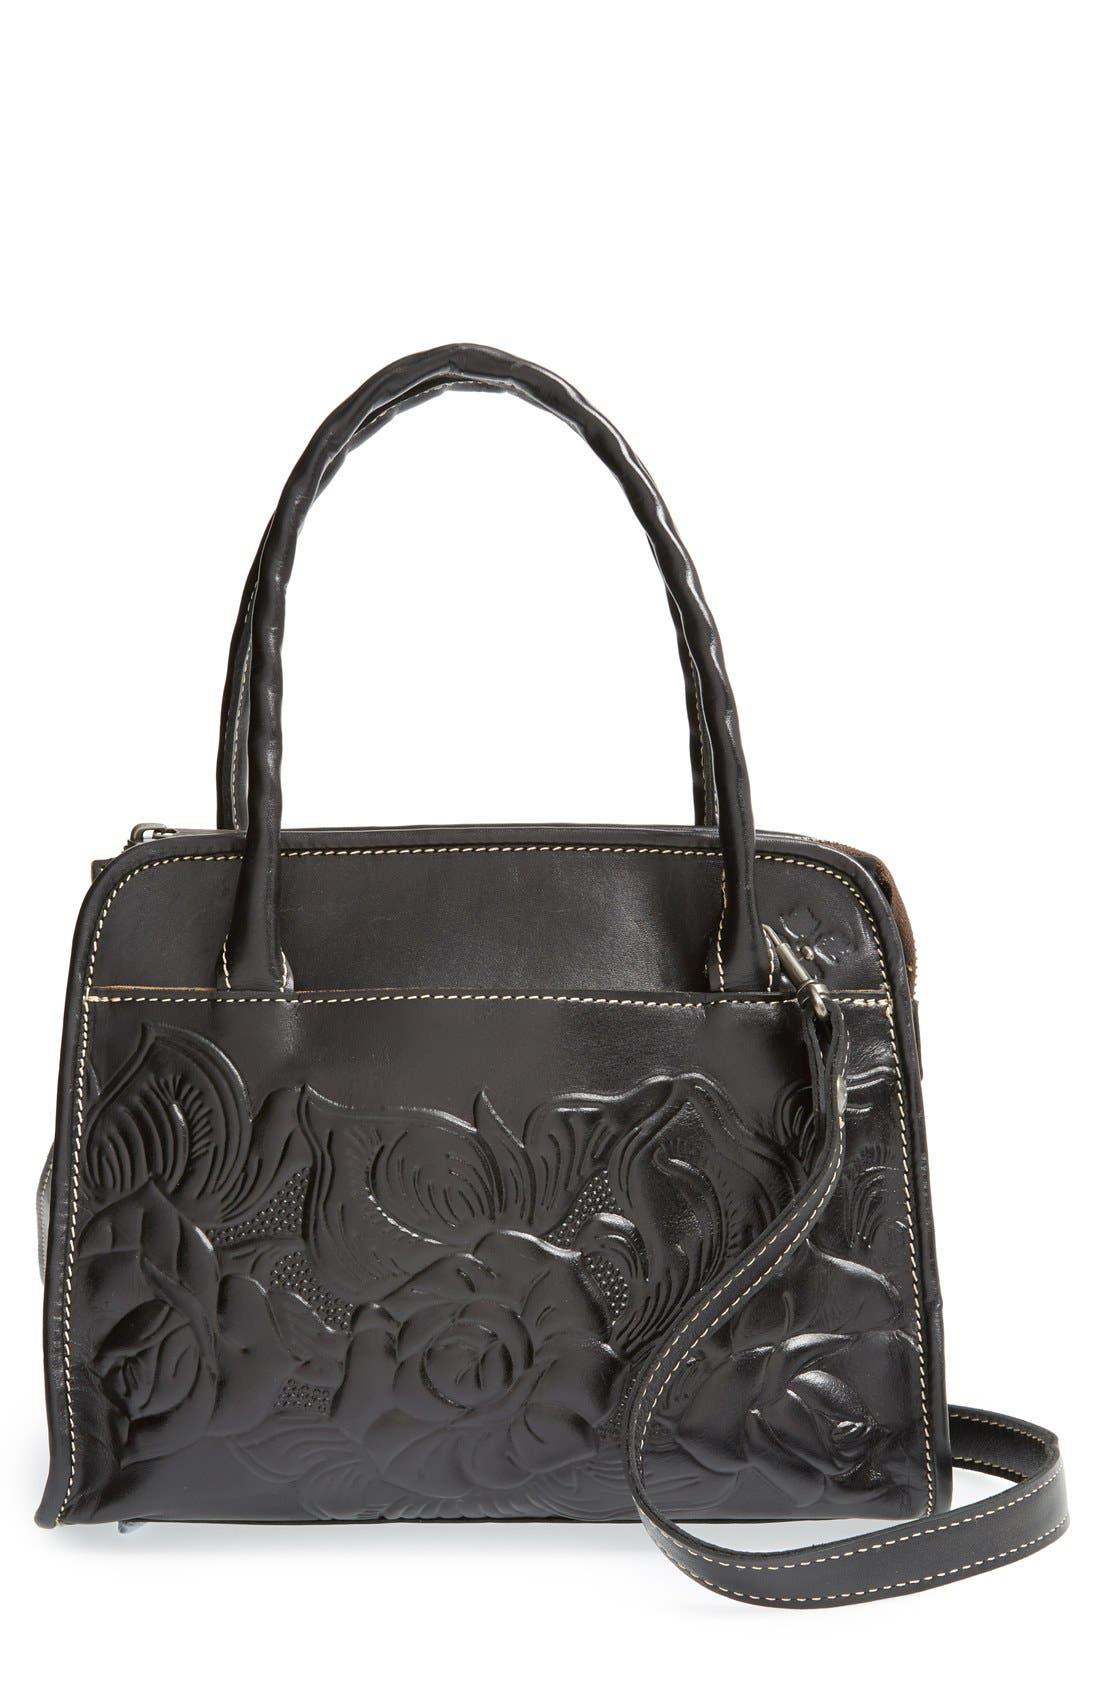 'Winter Rose - Paris' Italian Leather Satchel,                             Main thumbnail 1, color,                             001